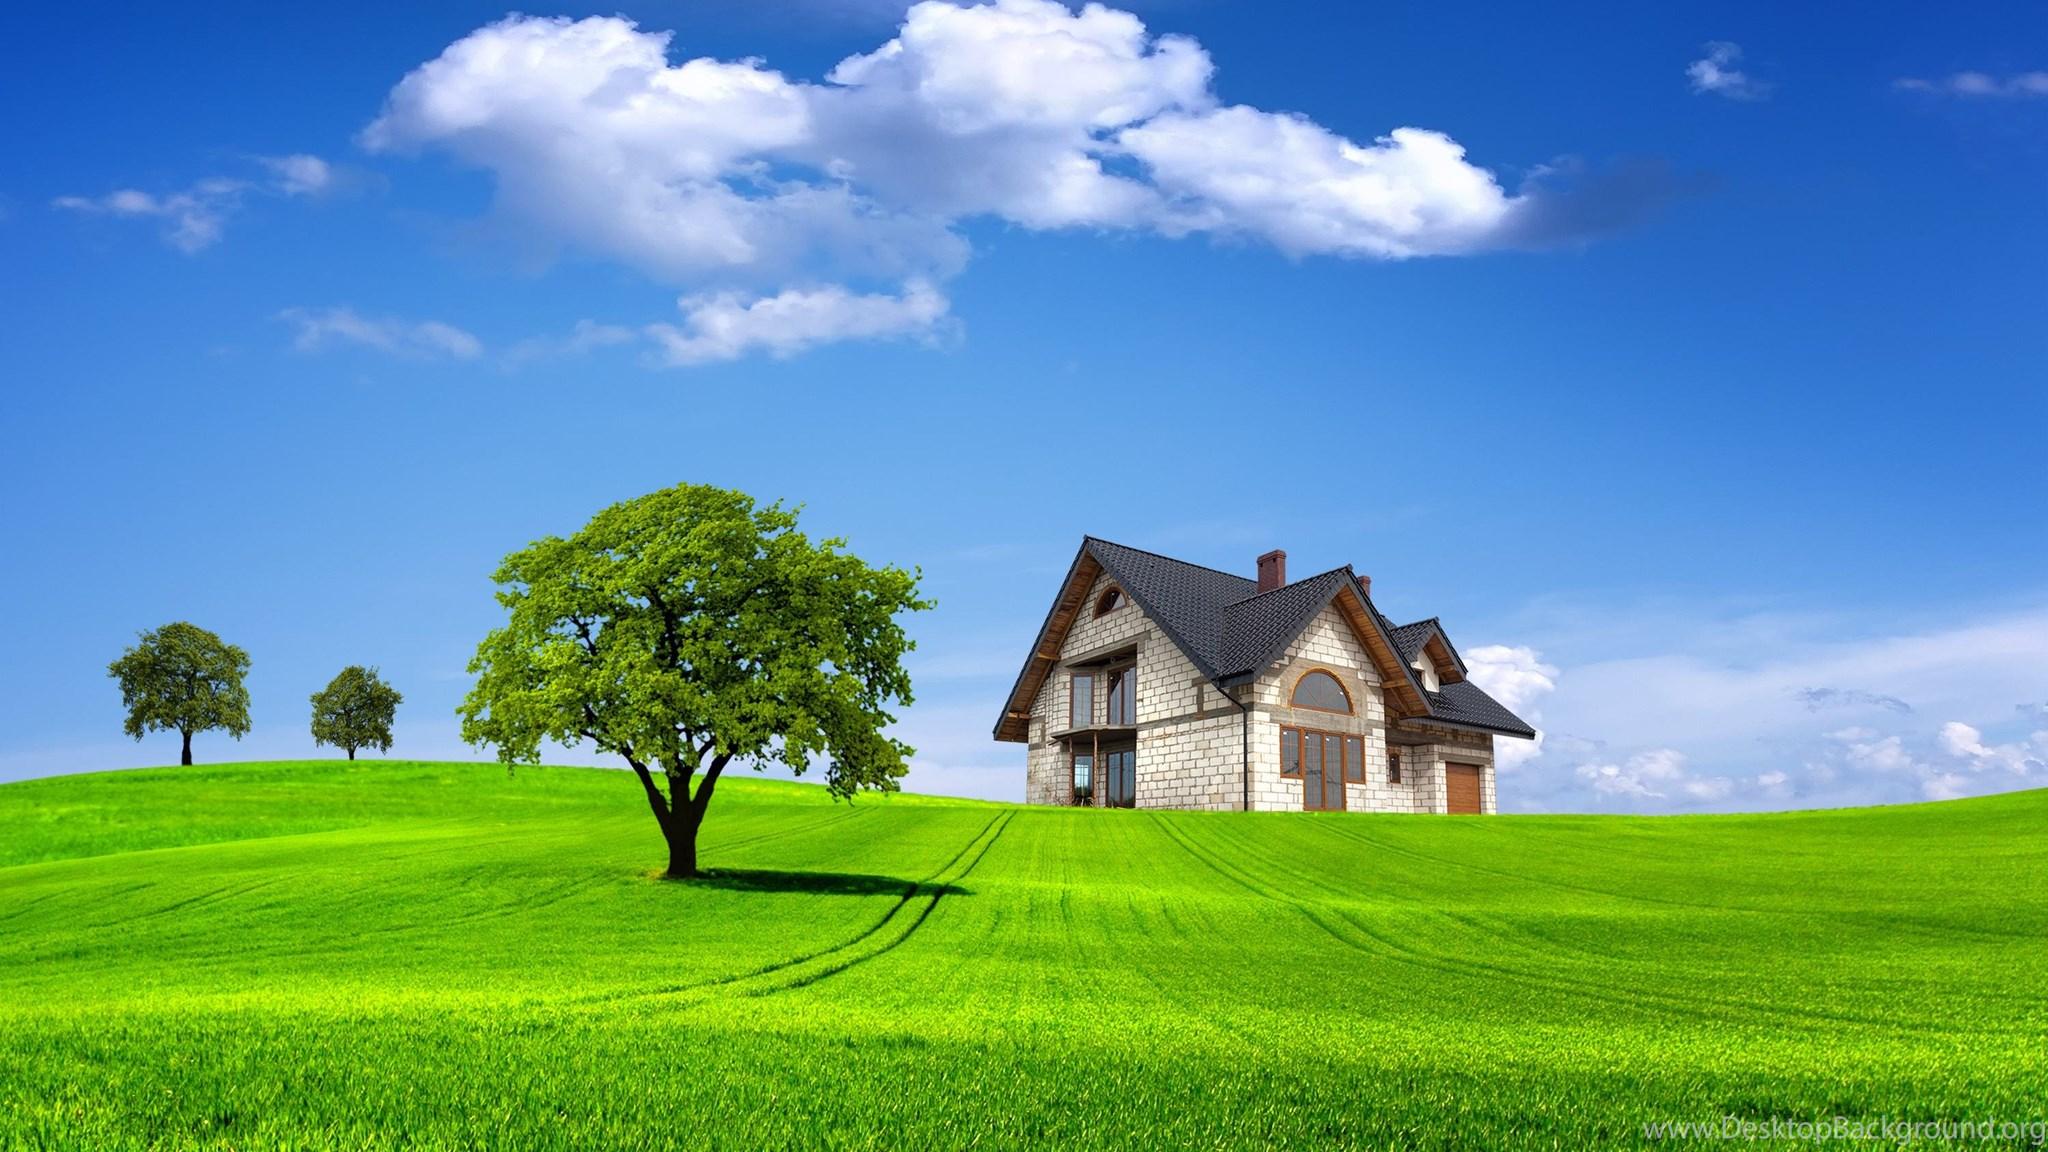 Home 3d Nature Wallpapers Hd Desktop Background